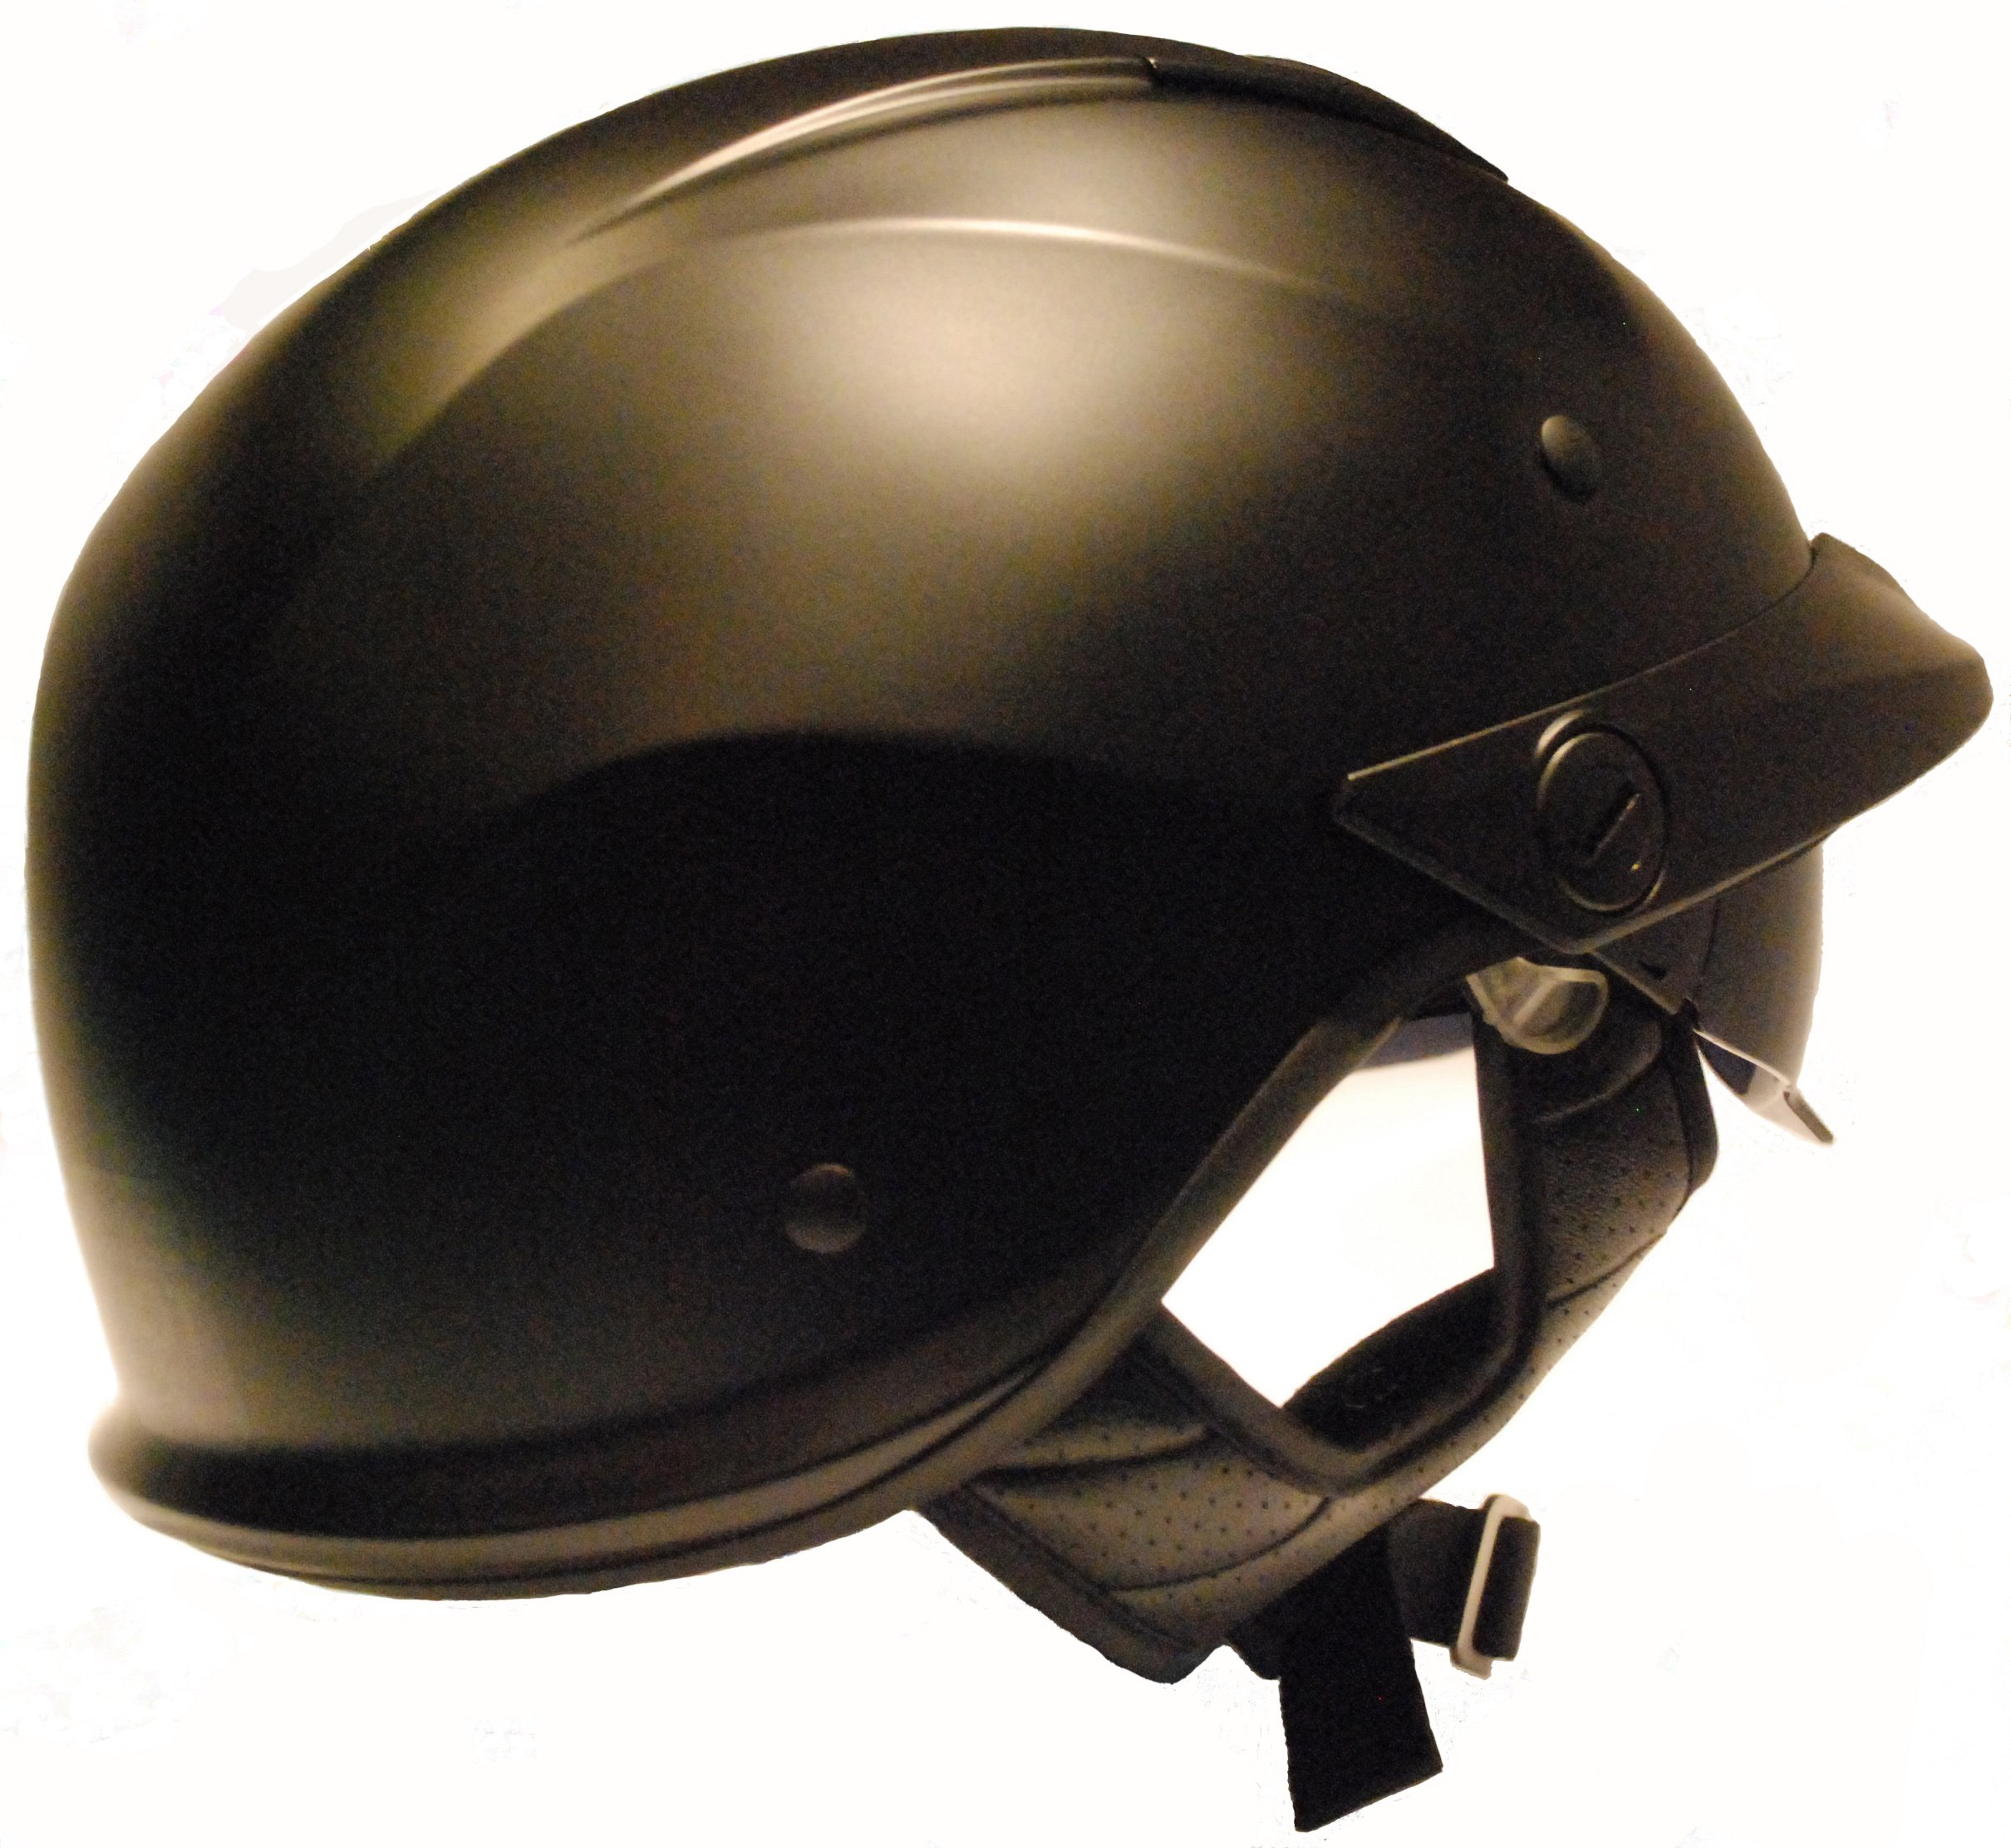 LS2 Helmets Rebellion Unisex-Adult Half Helmet Motorcycle Helmet (Matte Black, Medium)